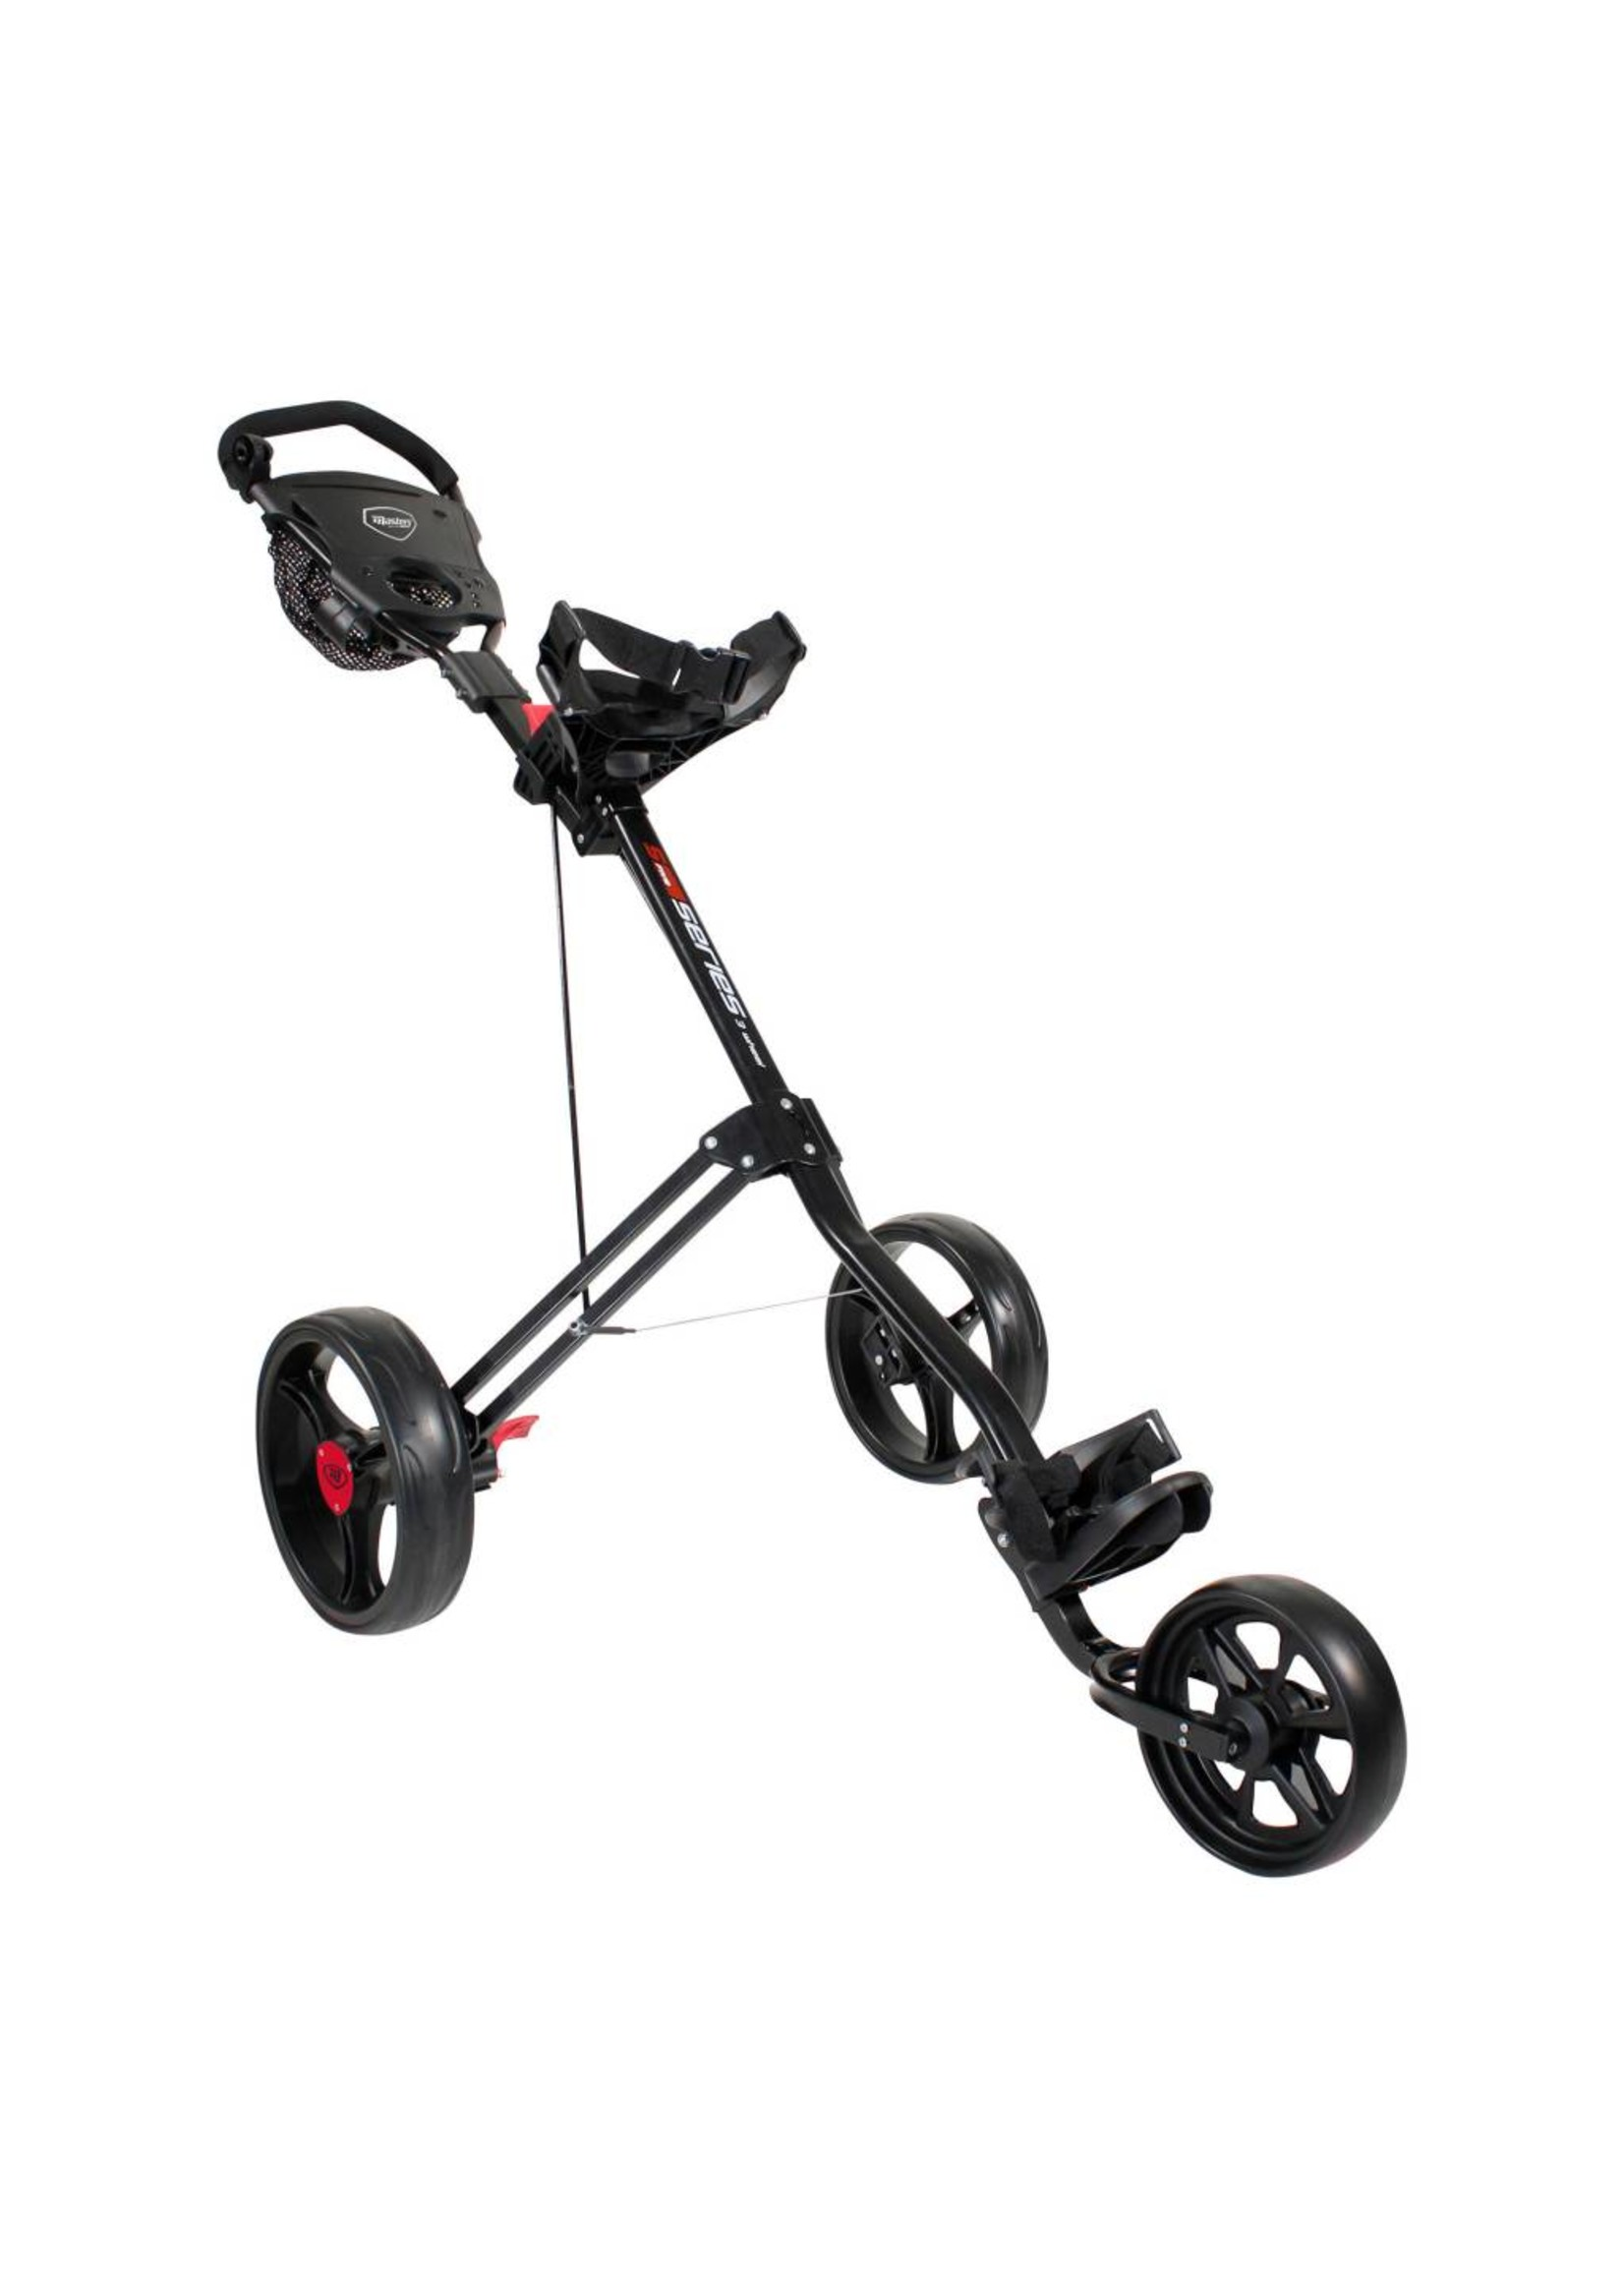 Masters Masters Five Series Three Wheeled Push Golf Trolley